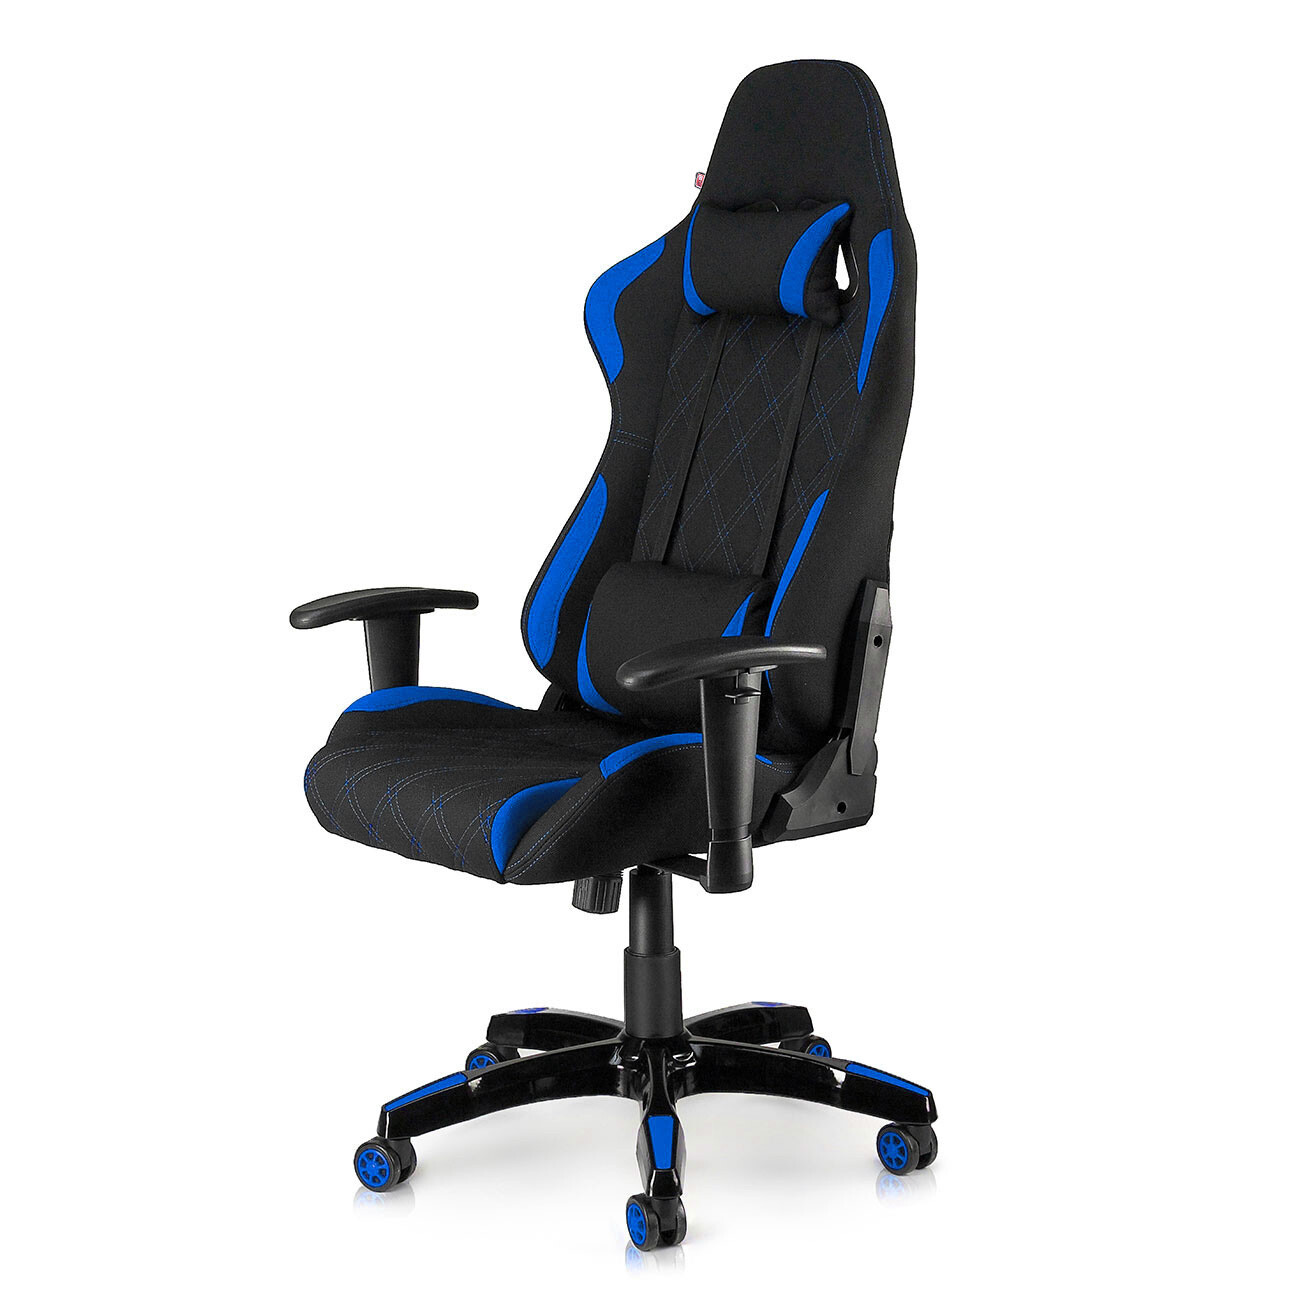 MY SIT Racing Chair Bürostuhl mit Stoff-Bezug - Blue Racer